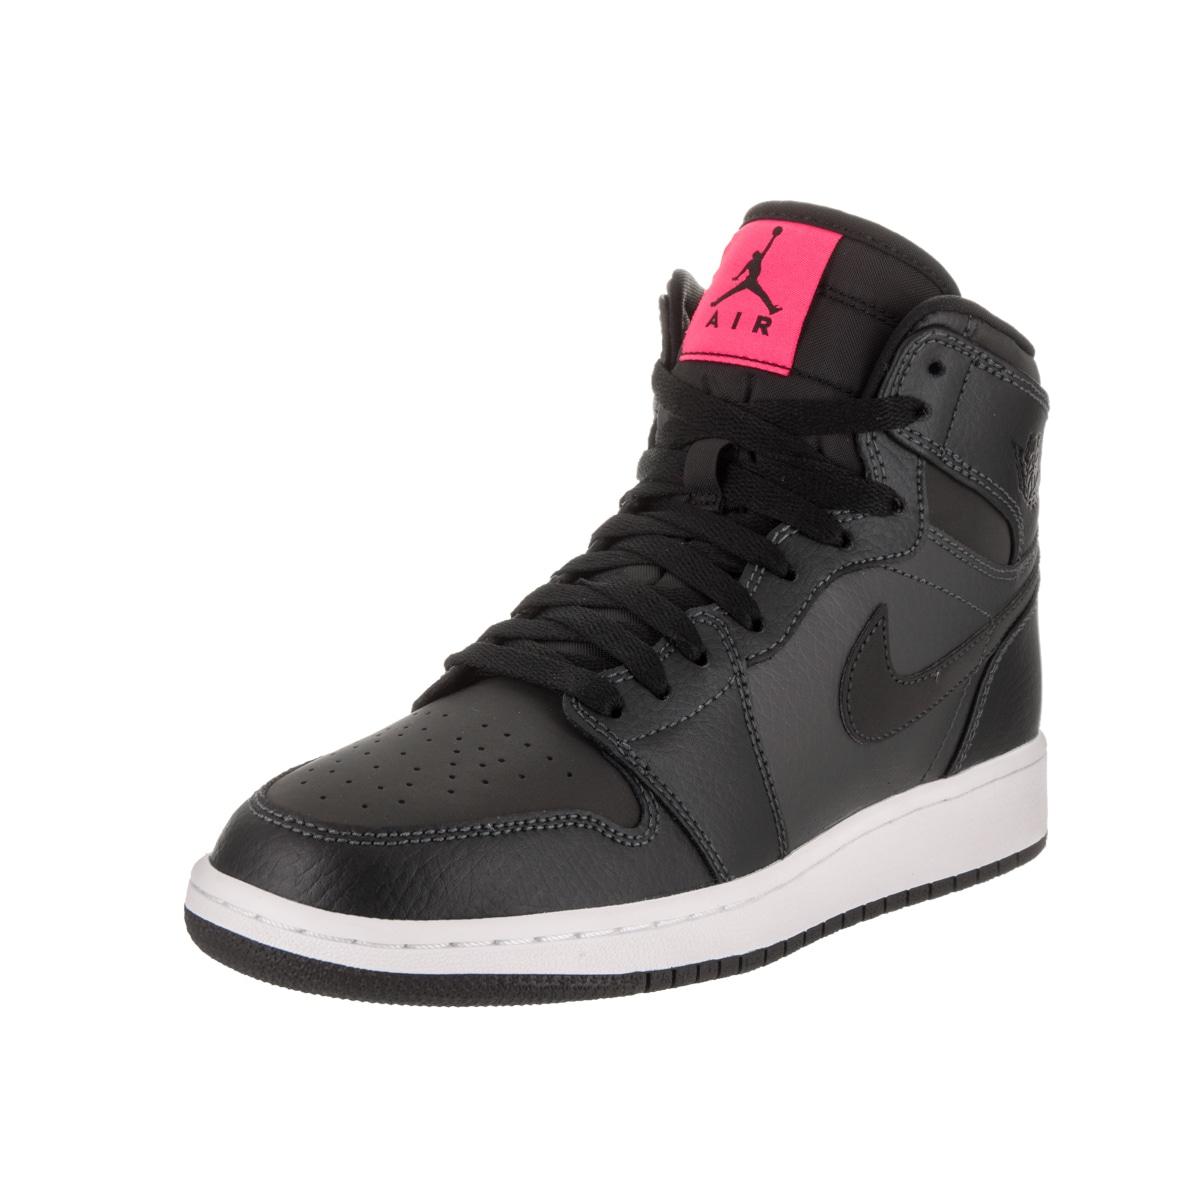 d962238ec14 Shop Nike Jordan Boys  Air Jordan 1 Retro High Gg Black Leather Basketball  Shoe - Free Shipping Today - Overstock - 14355542